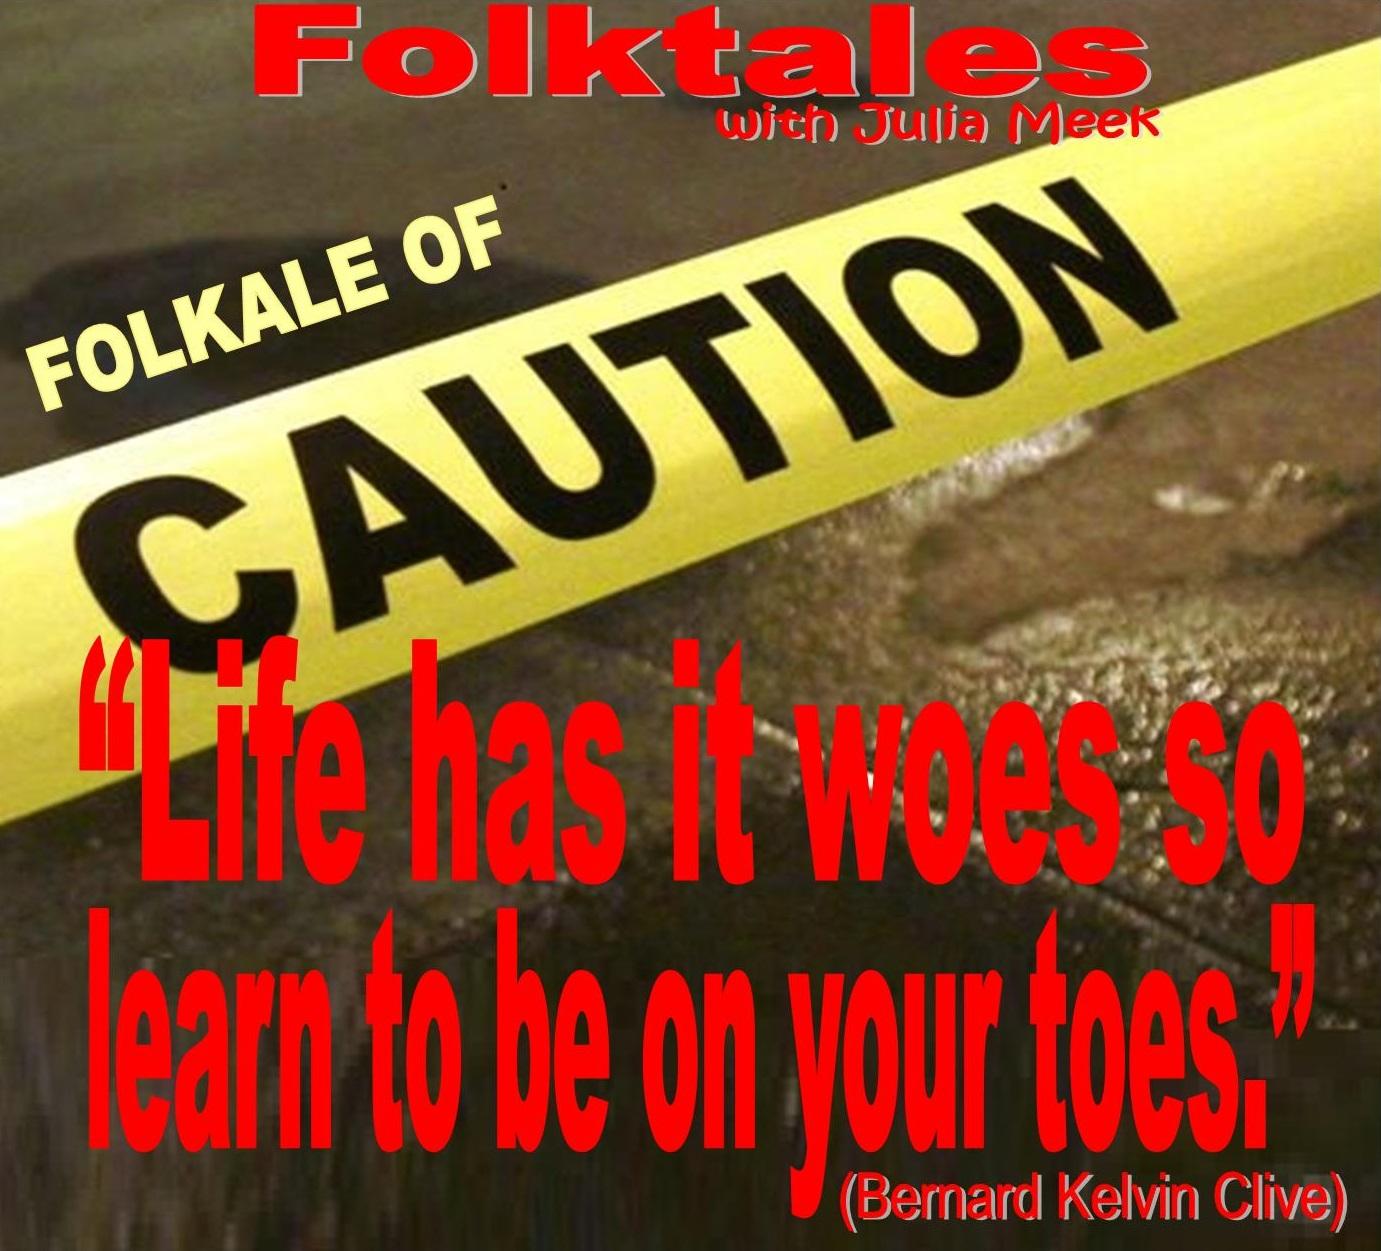 Caption: WBOI's Folktale of Caution, Credit: Julia Meek